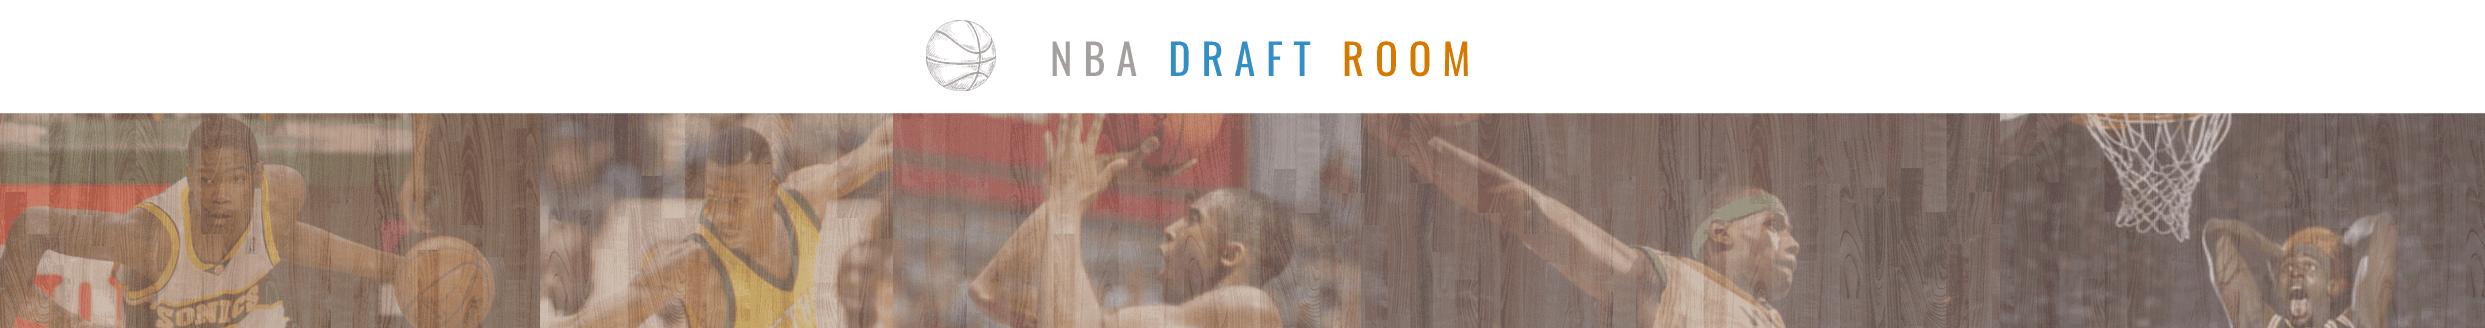 NBA Draft Room